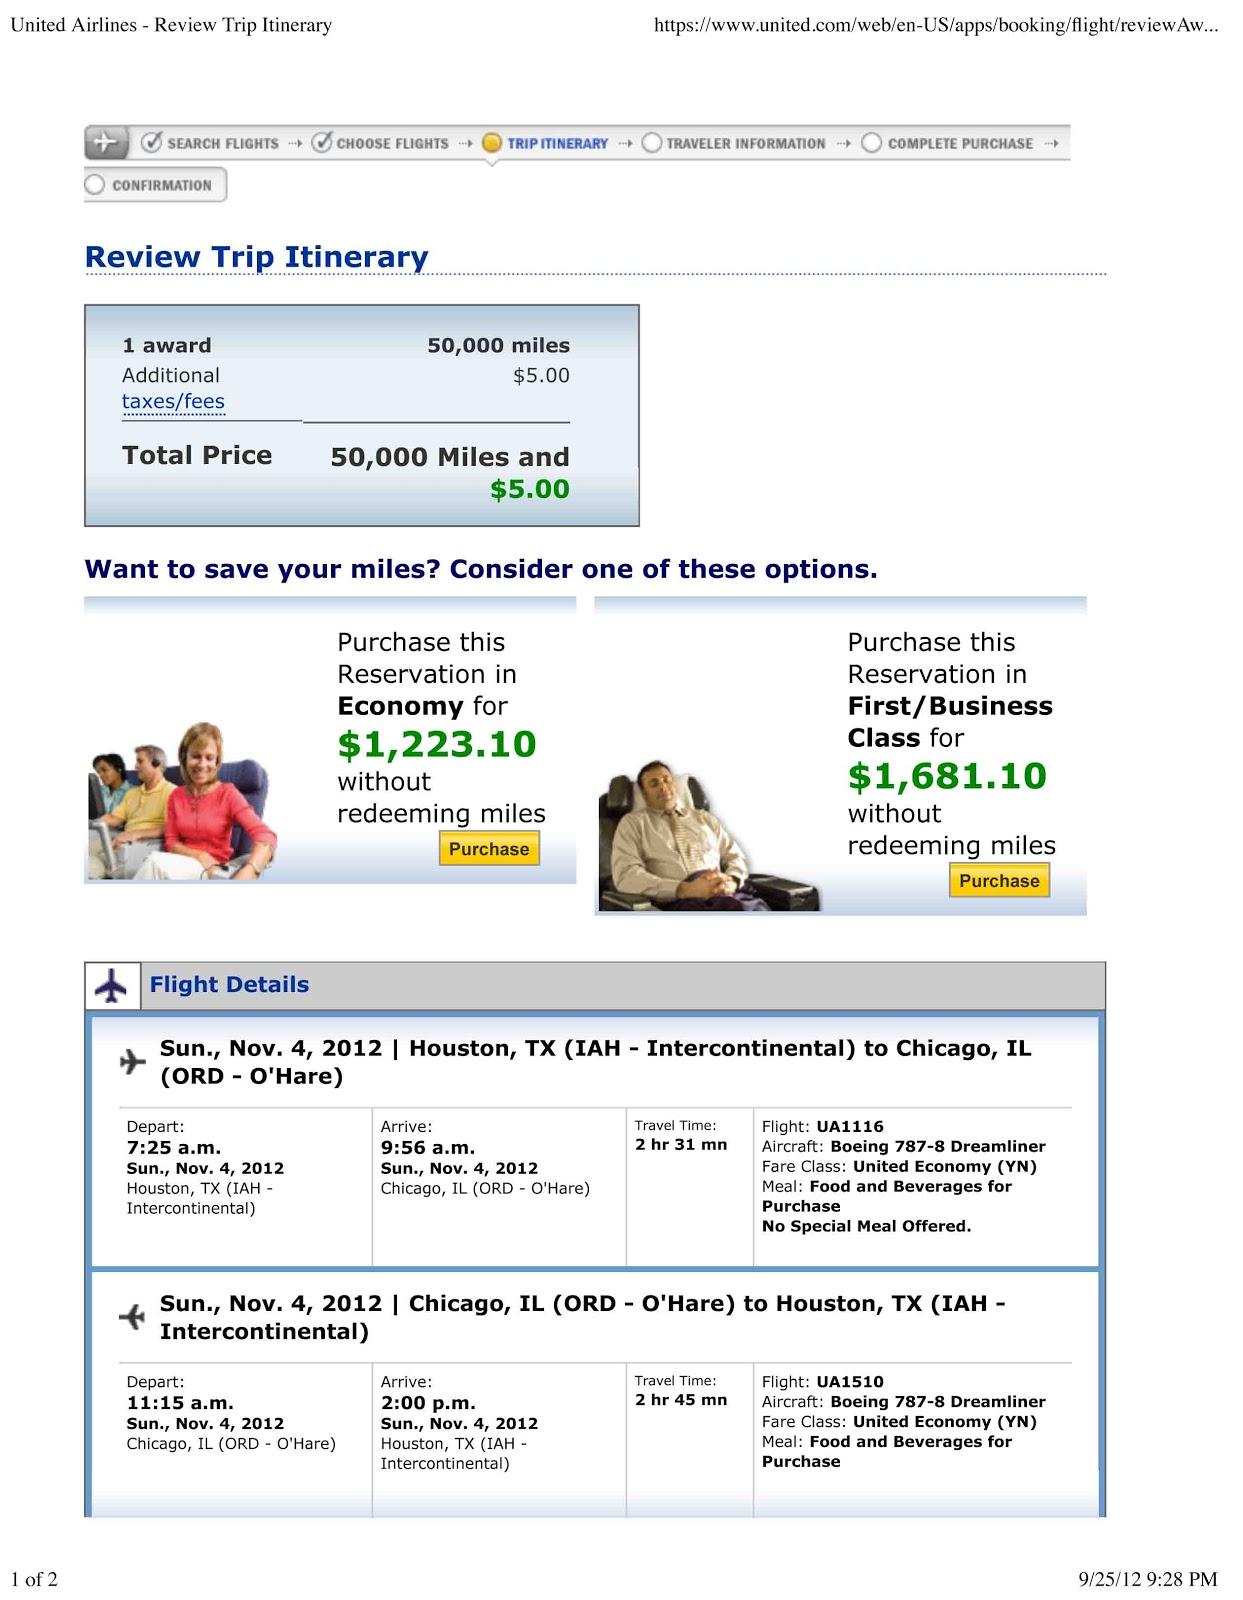 http://3.bp.blogspot.com/-w81onHzg8KE/UJi5Mg8zD3I/AAAAAAAAFsk/y69ZF52gVZk/s1600/United-Itinerary.jpg